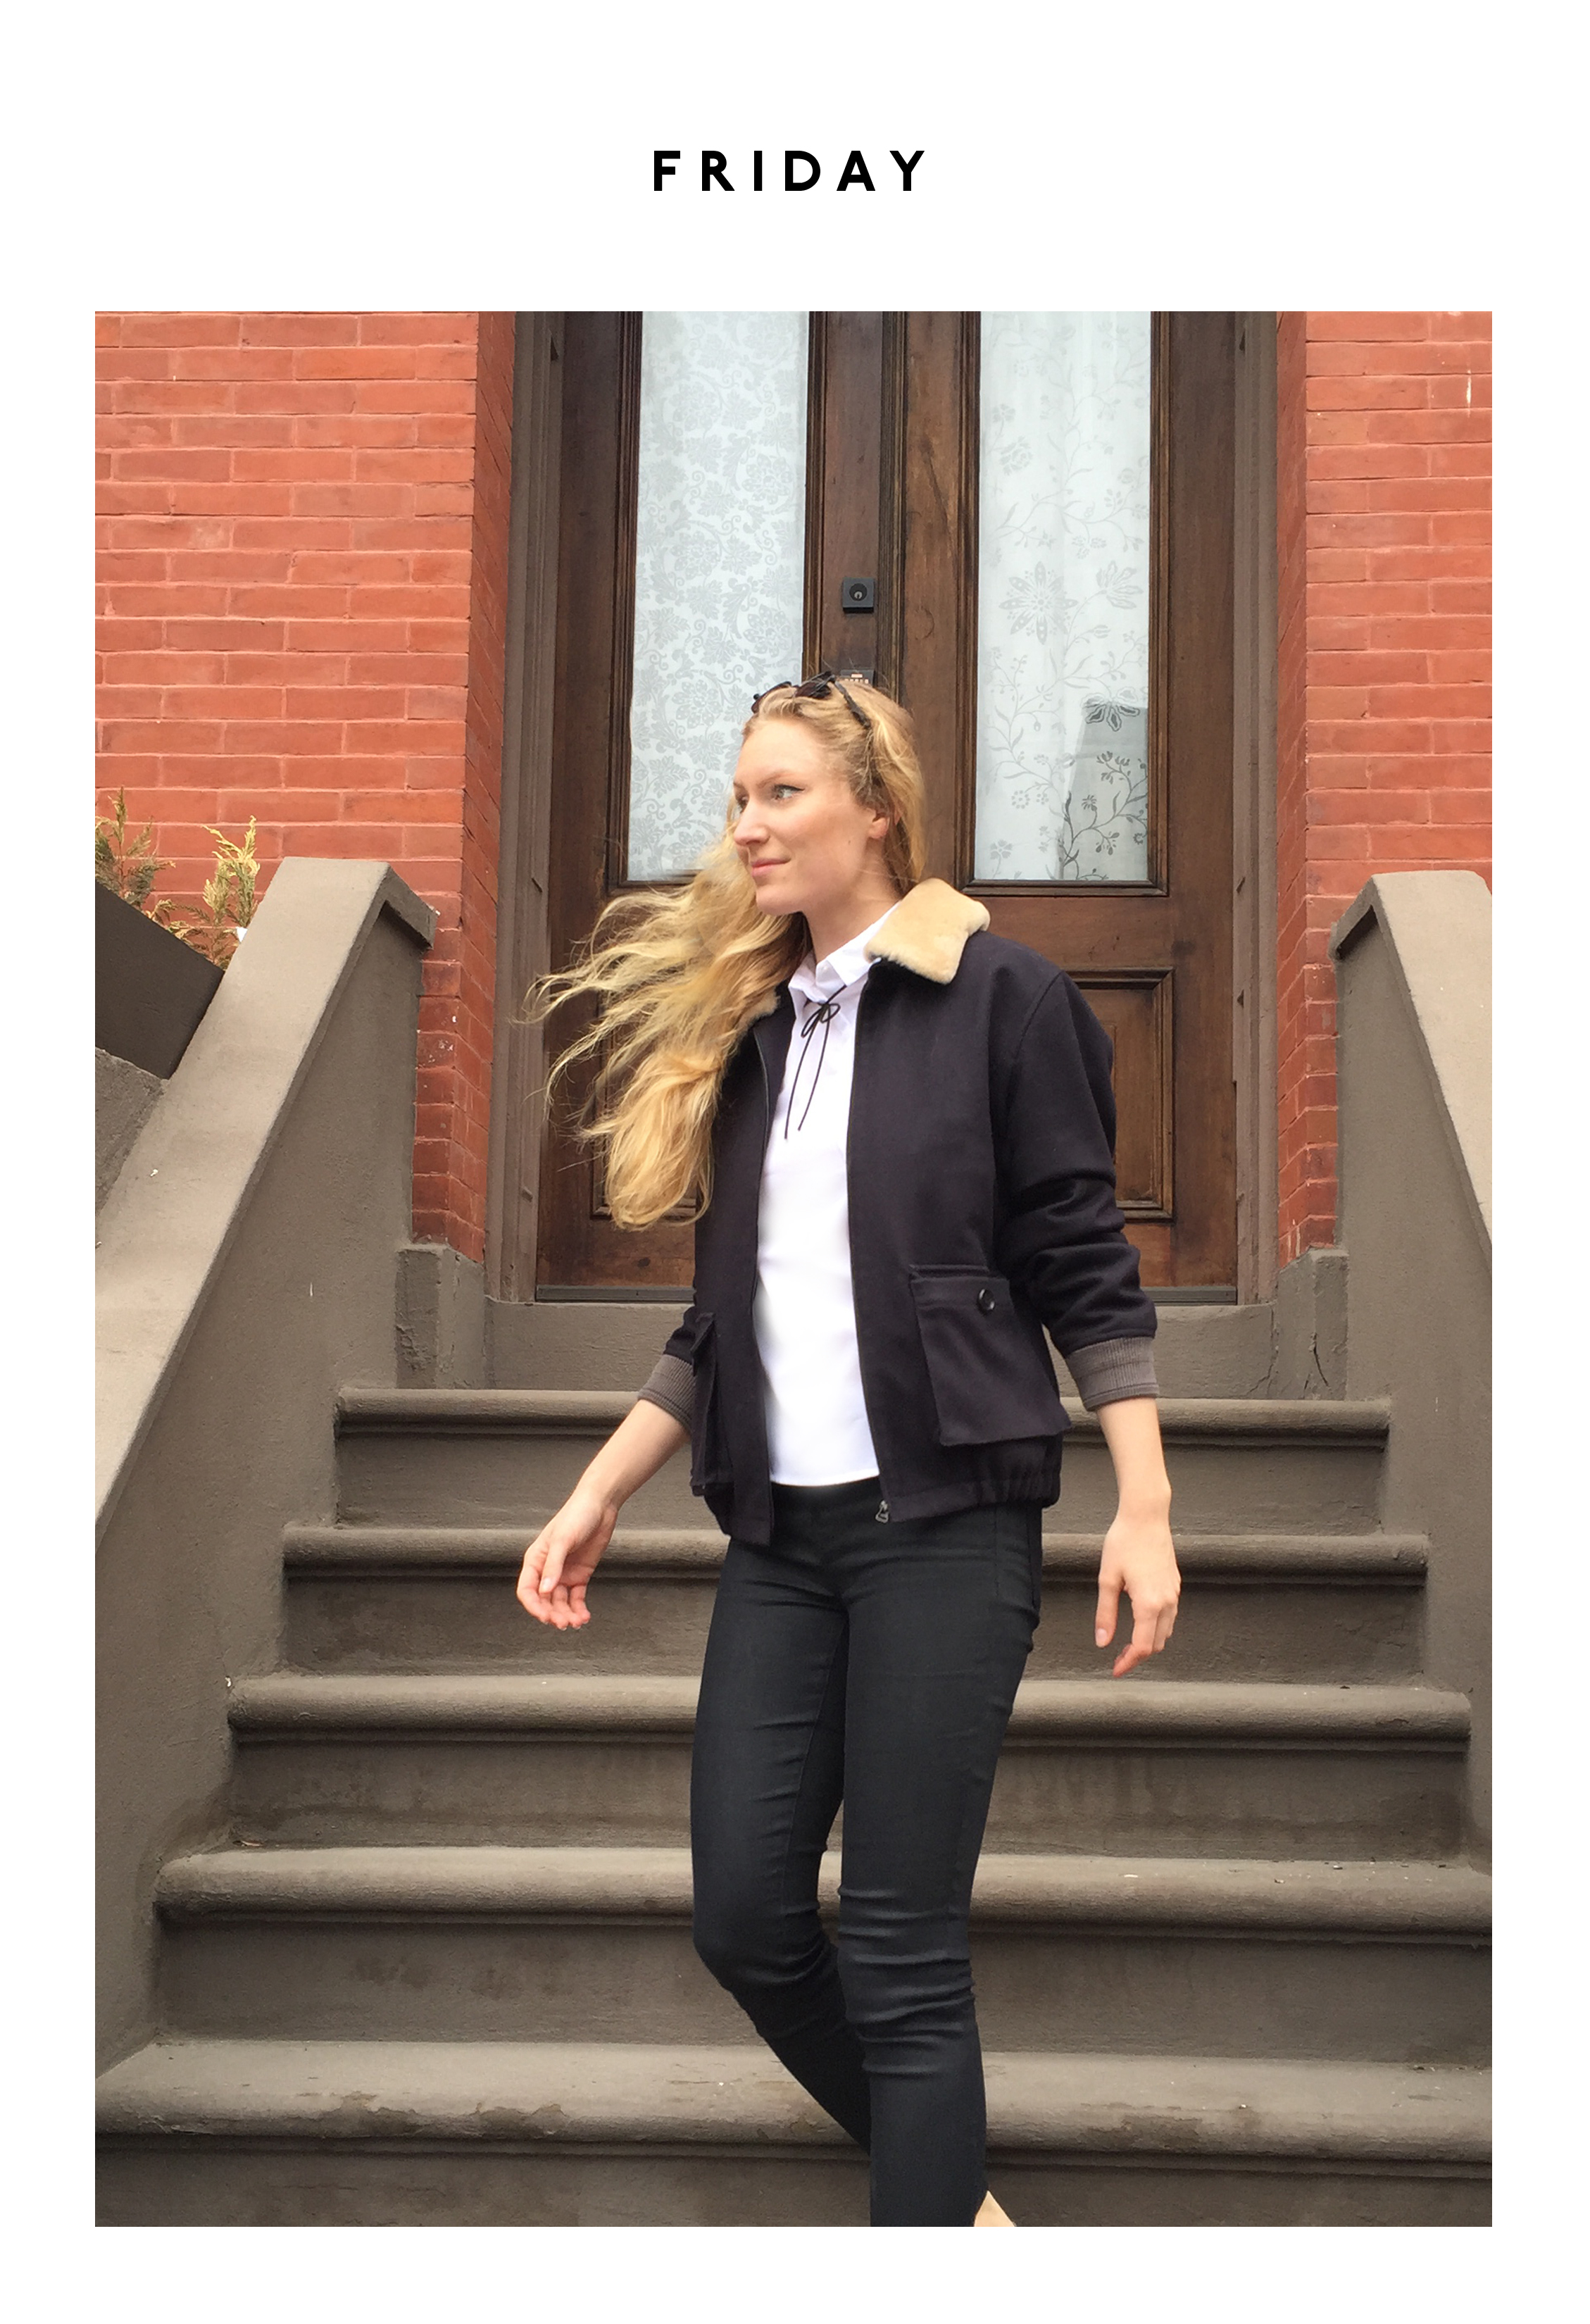 Creative Explains Why She Wears Uniform To Work Agency News AdAge